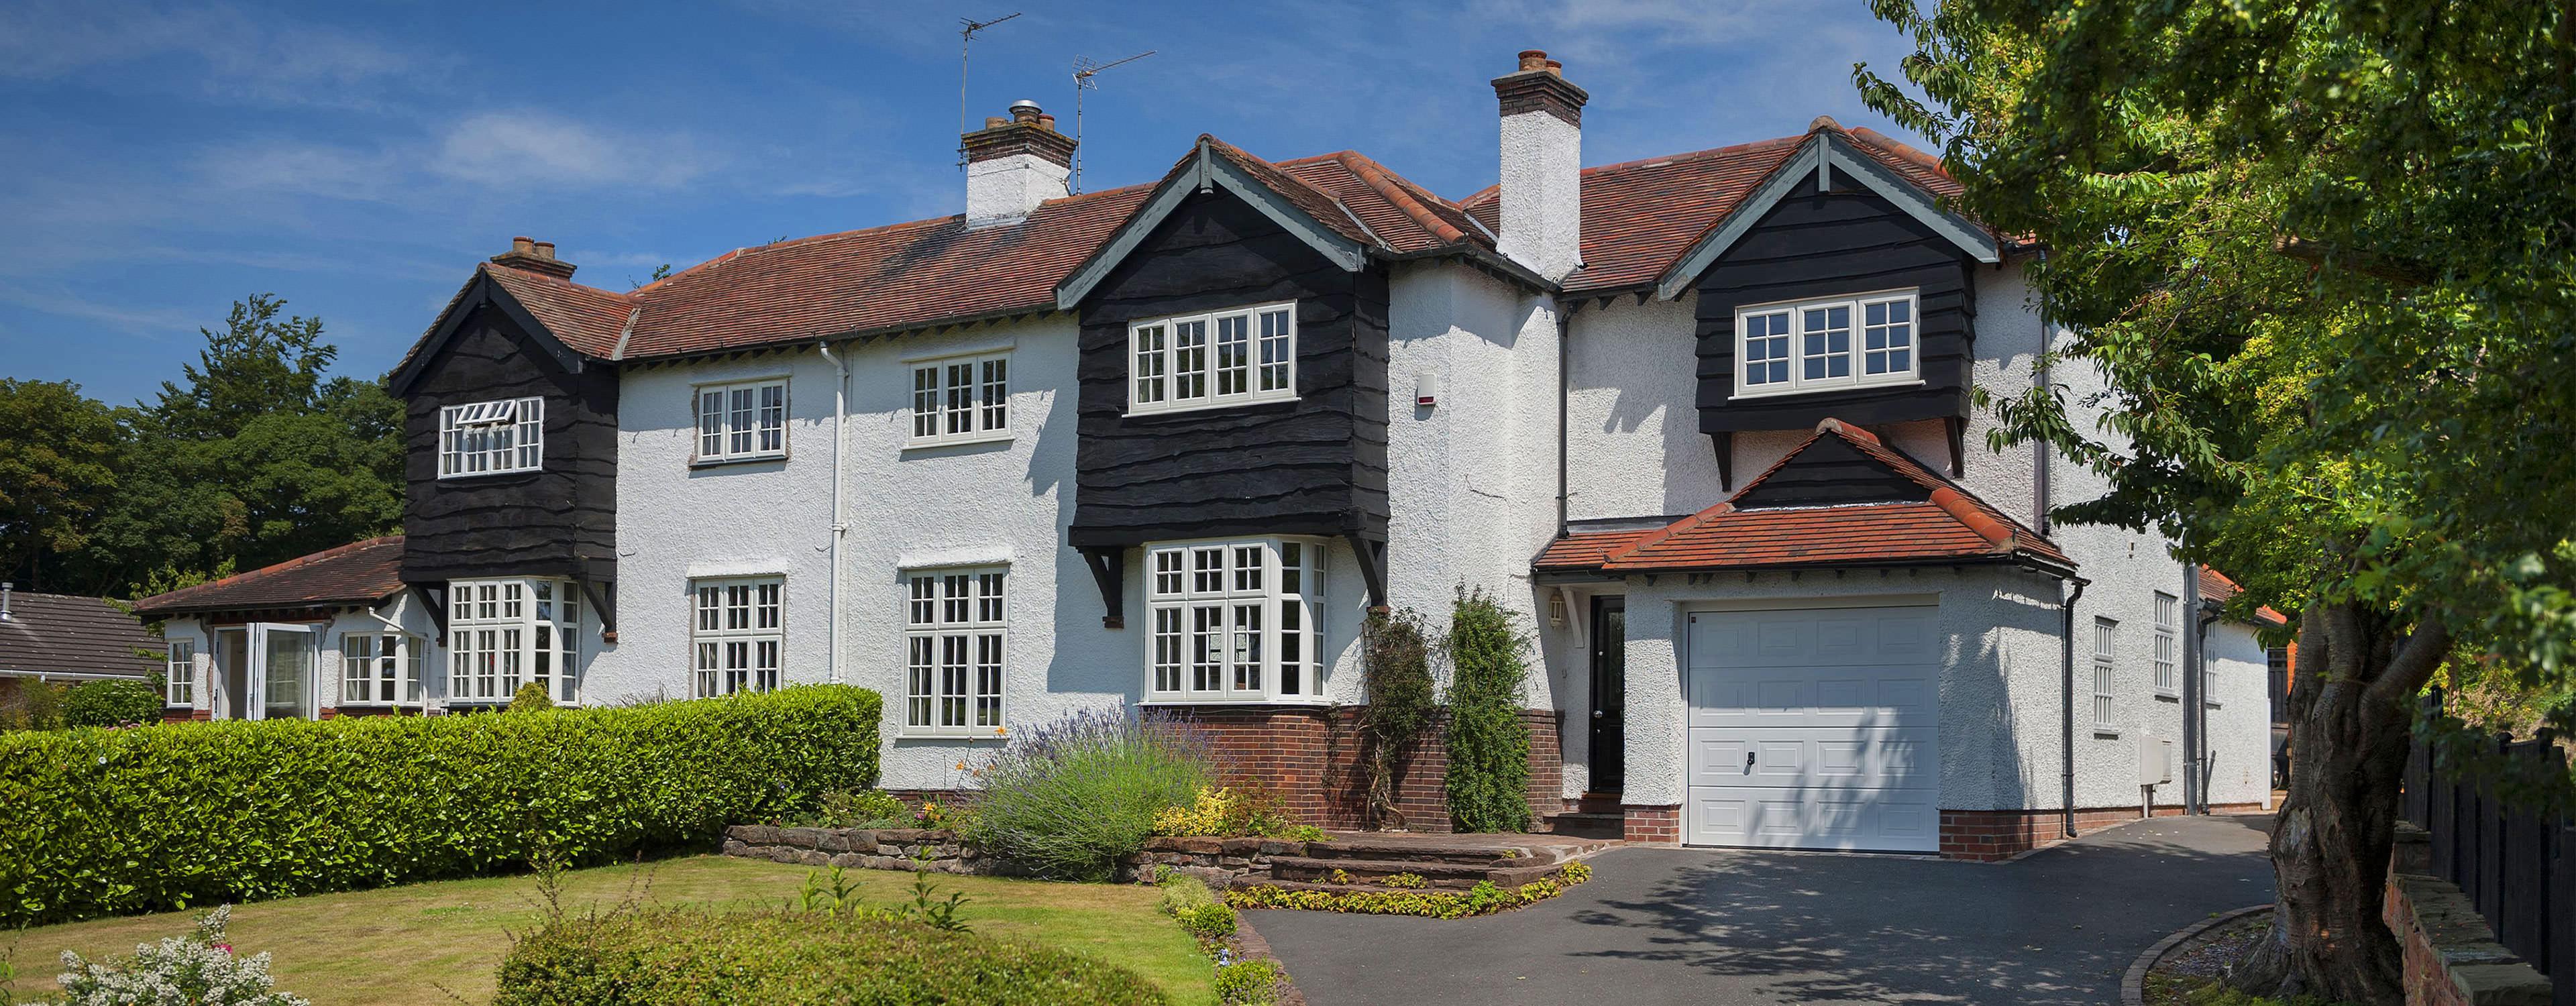 Casement Windows Harlow Essex